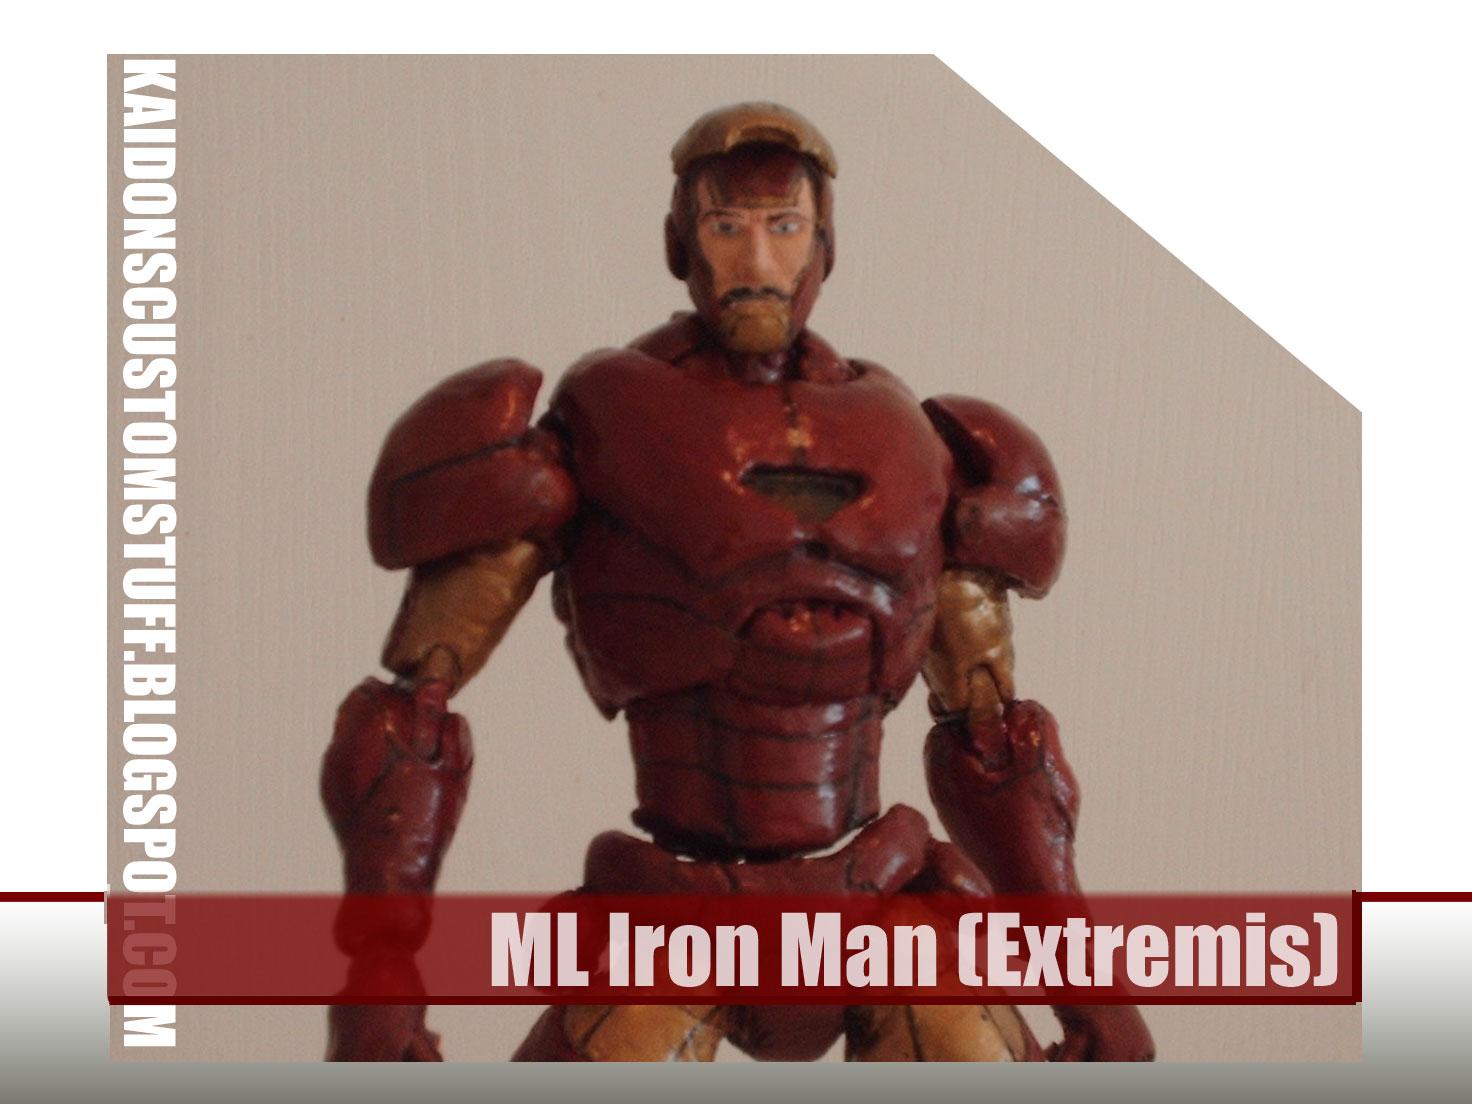 http://2.bp.blogspot.com/_NydzcGVJtdA/TObiheTeGmI/AAAAAAAAATs/qknslYSVltM/s1600/ML-Iron-Man-Extremis-01.jpg